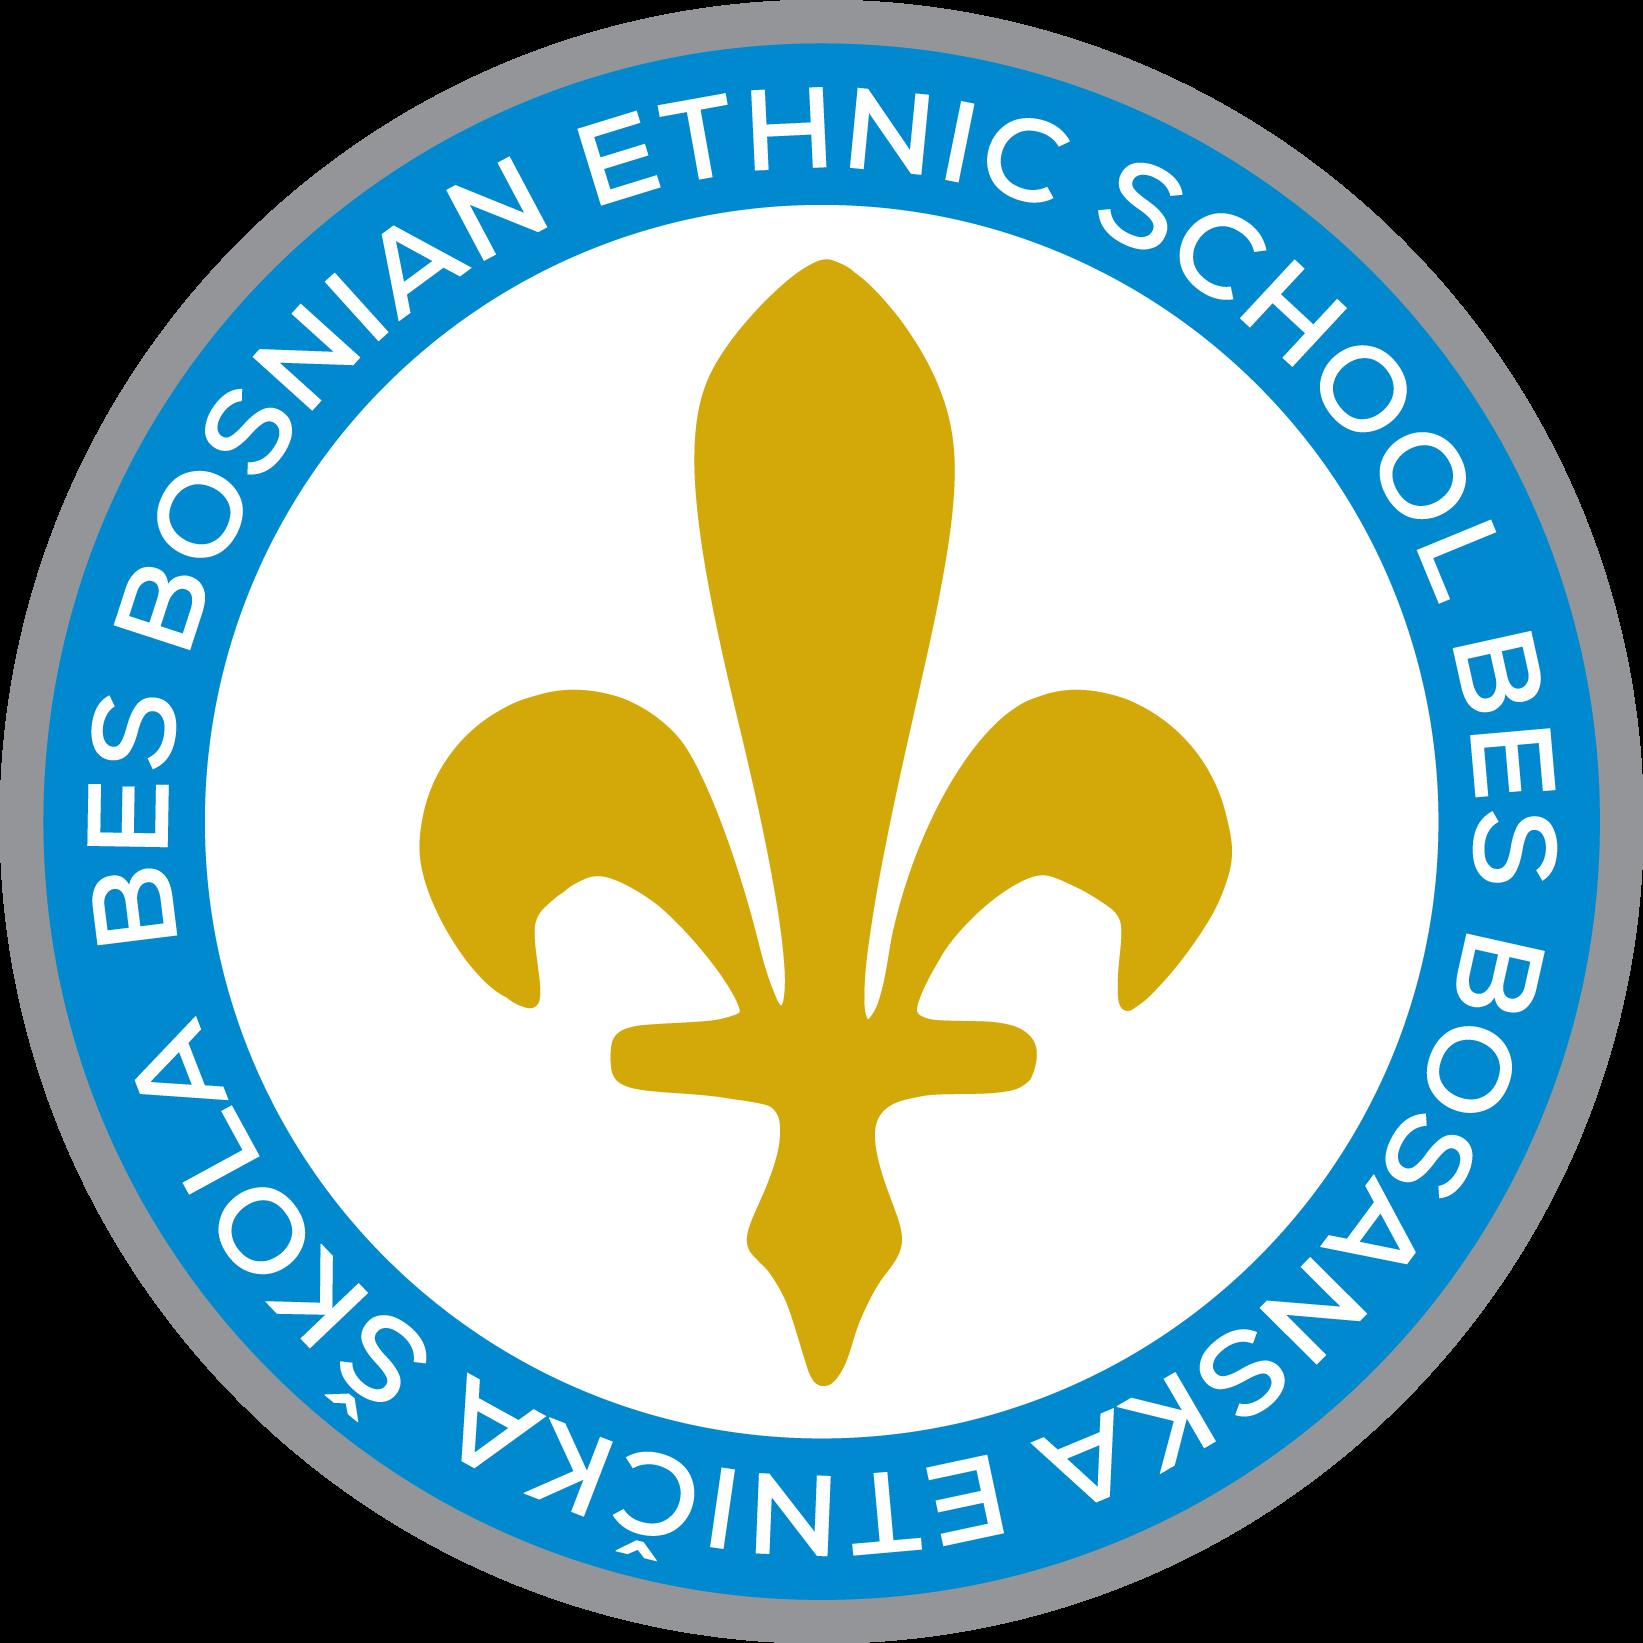 Bosnian Ethnic School Logo